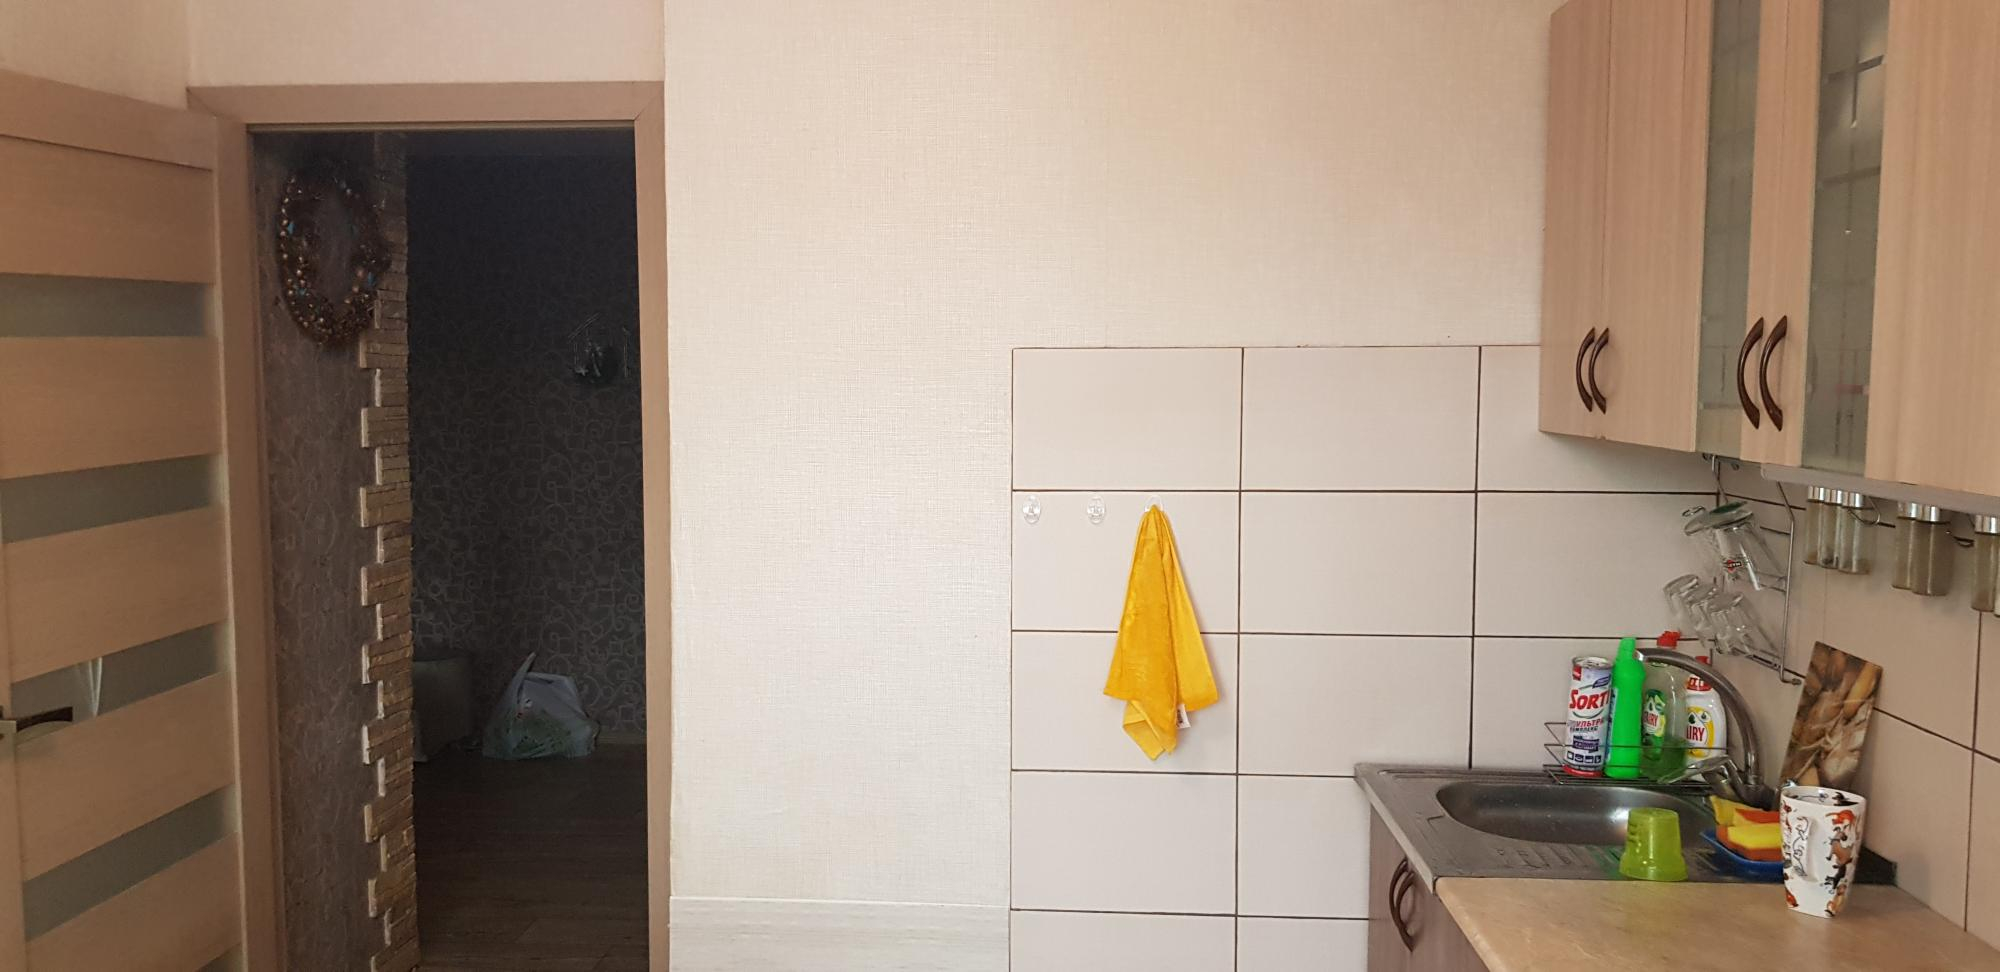 2к квартира улица Краснодарская, 3 | 18000 | аренда в Красноярске фото 15